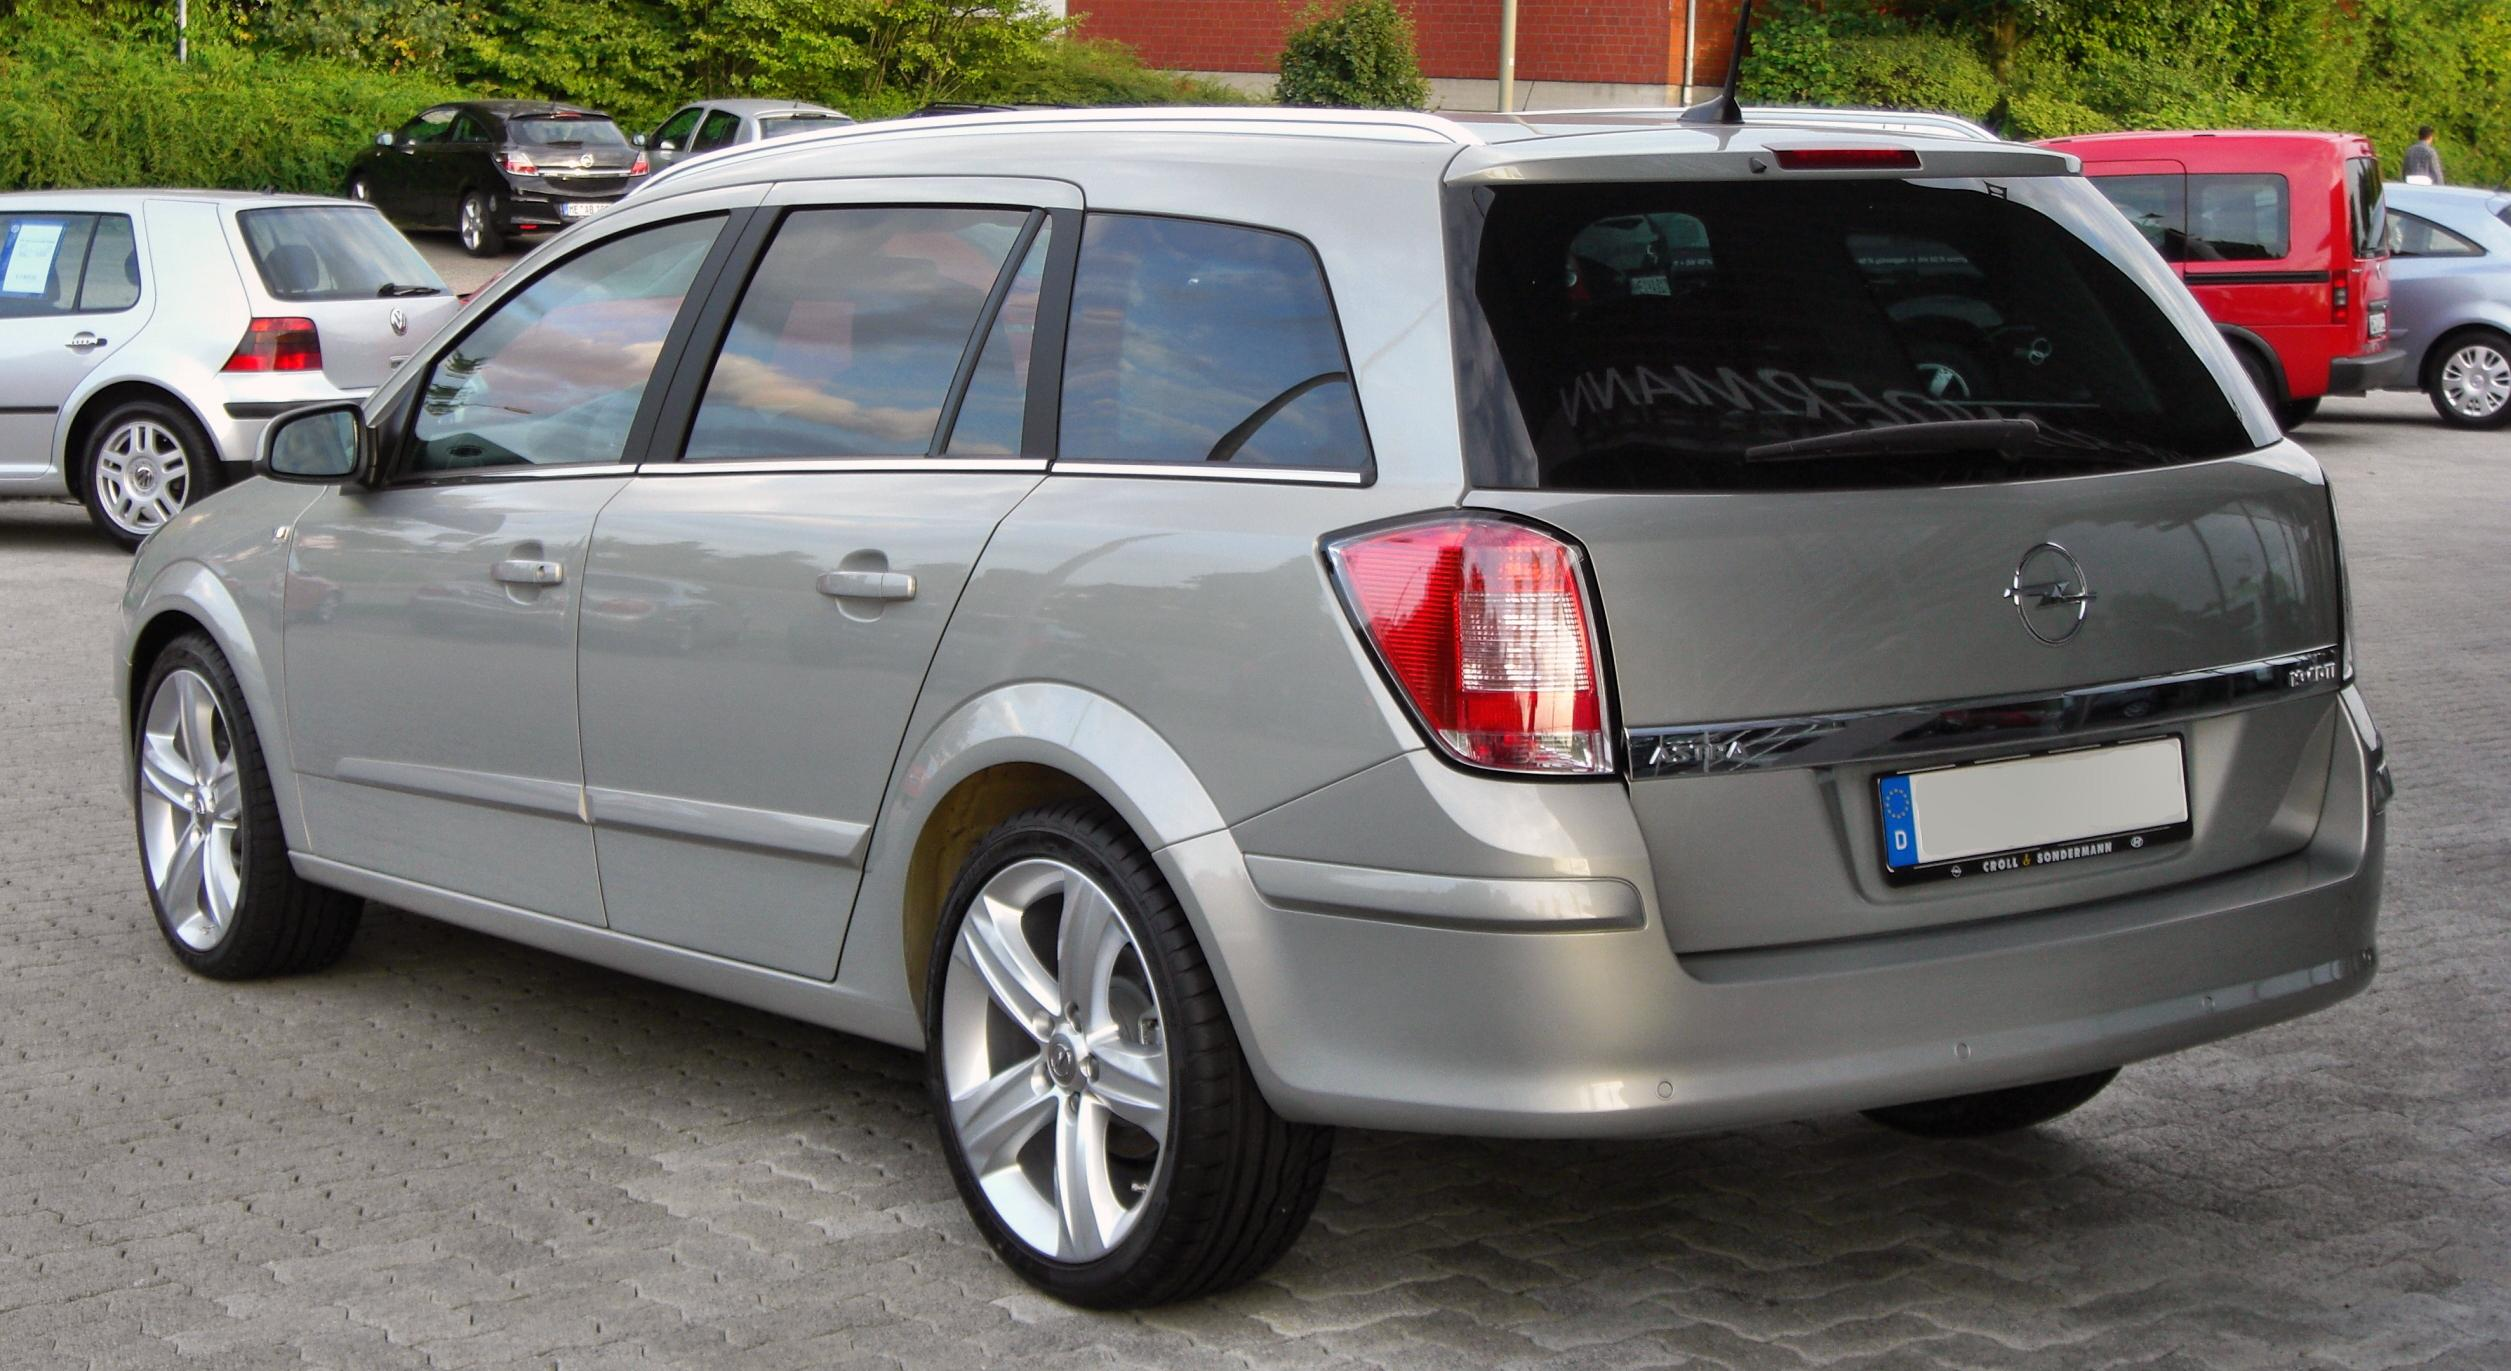 file opel astra h caravan 1 9 cdti rear jpg wikipedia republished wiki 2